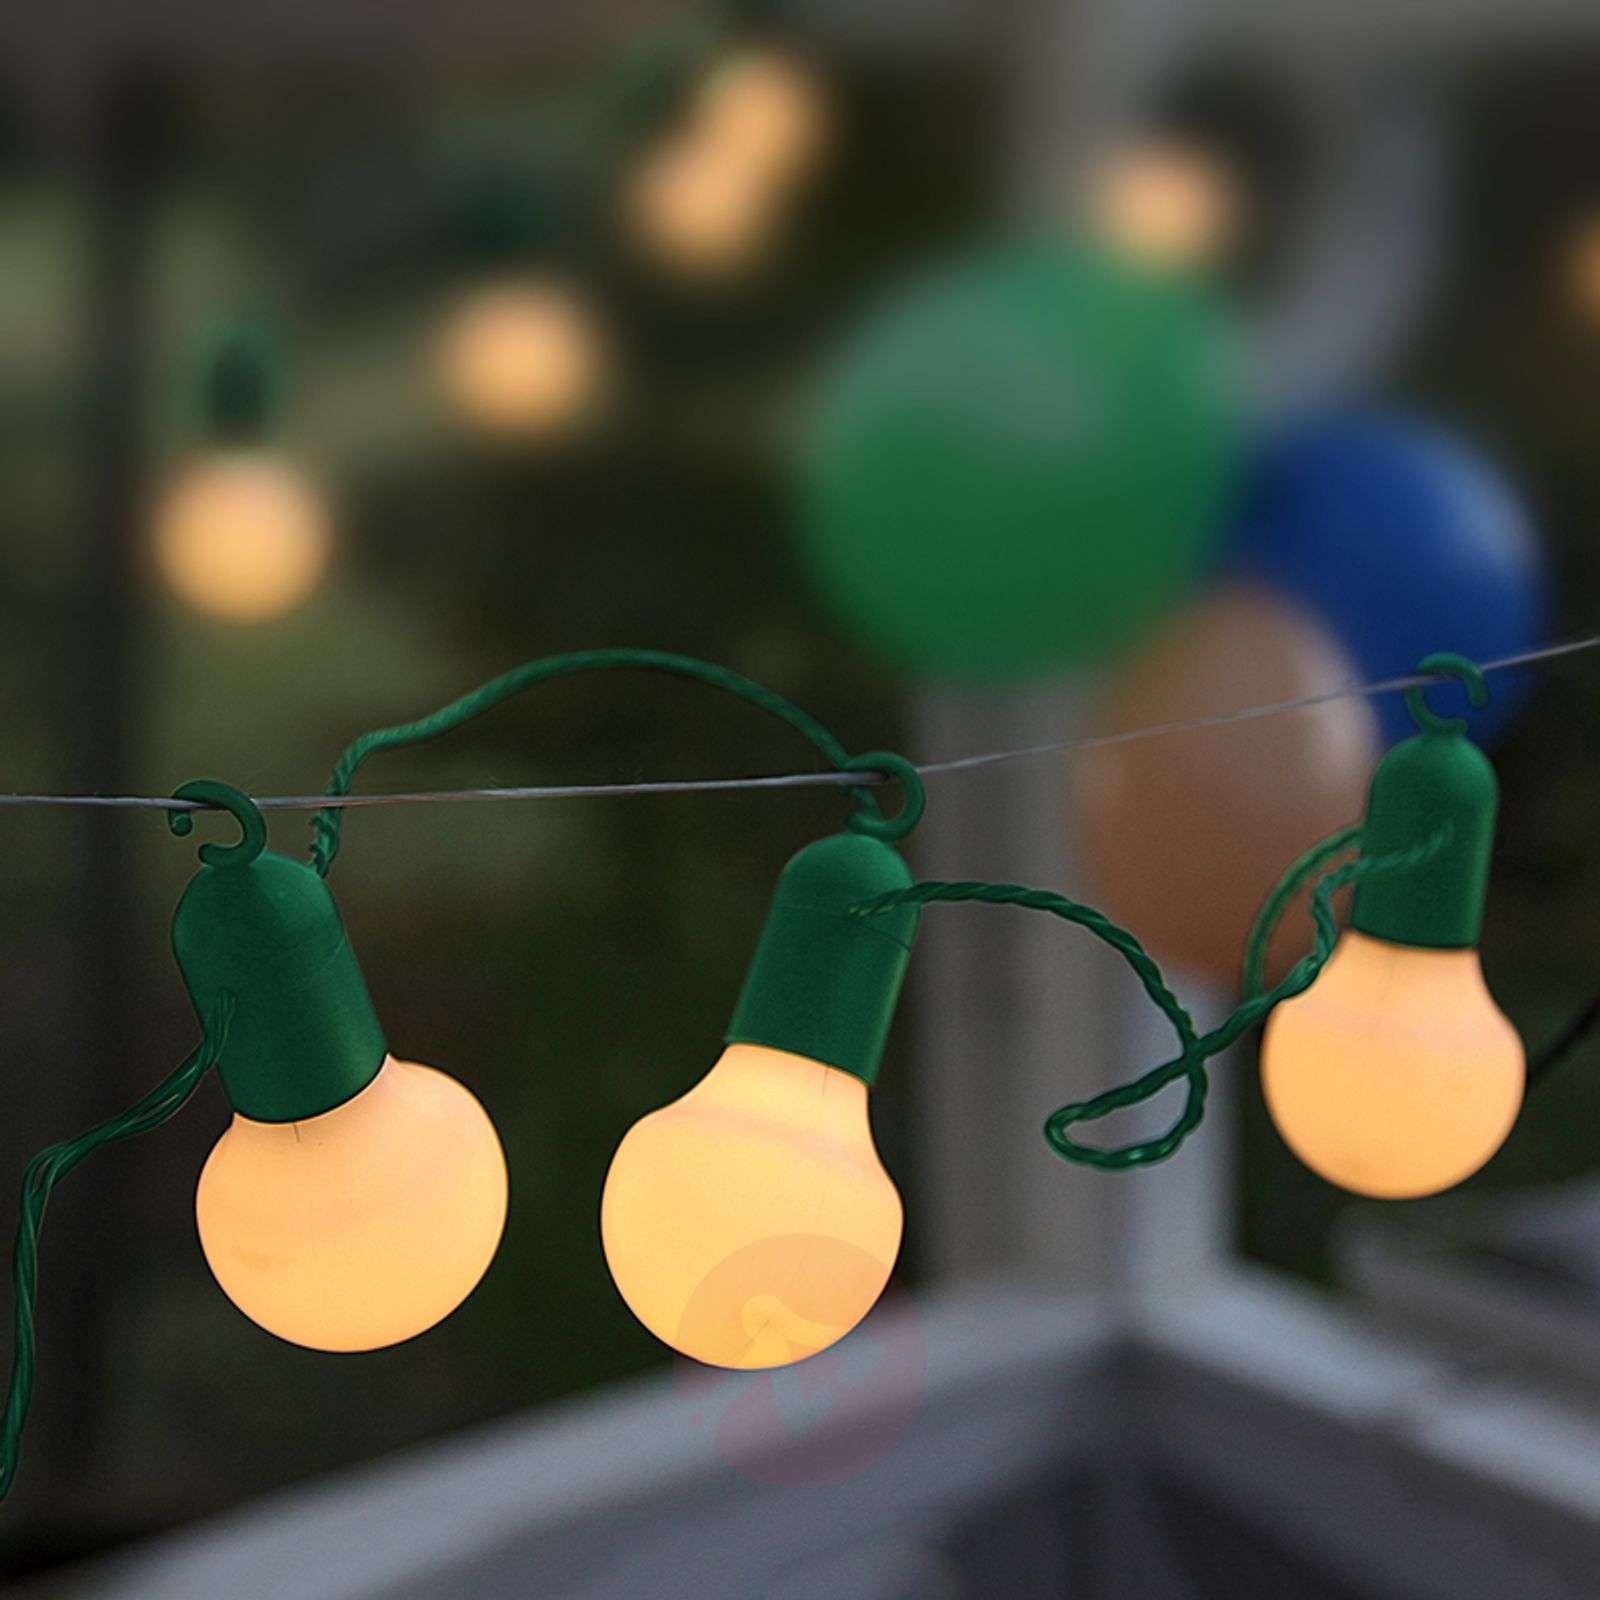 LED-juhlavalosarja ELIN, 20 polttimoa-1522414-07